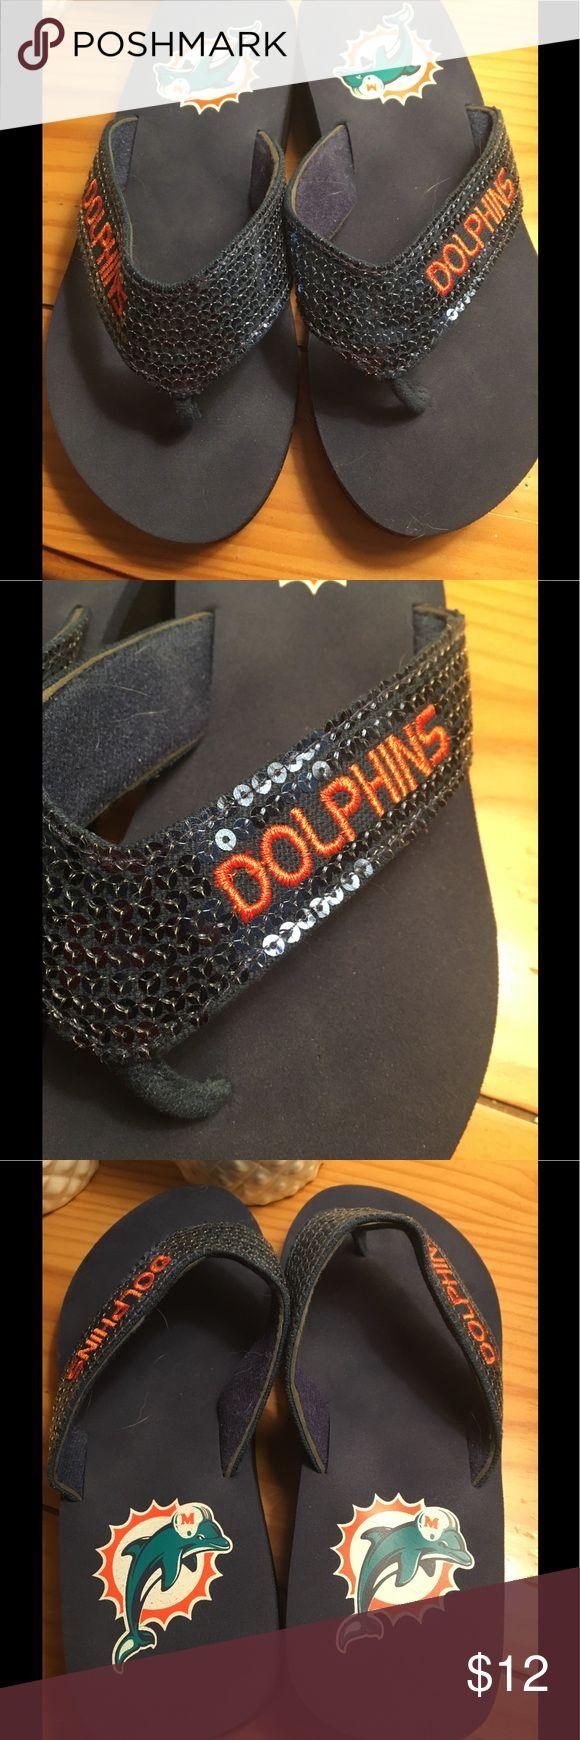 Women's Miami dolphin flips flops size 8 blue Official NFL merchandise  Size 8  In great shape Shoes Sandals